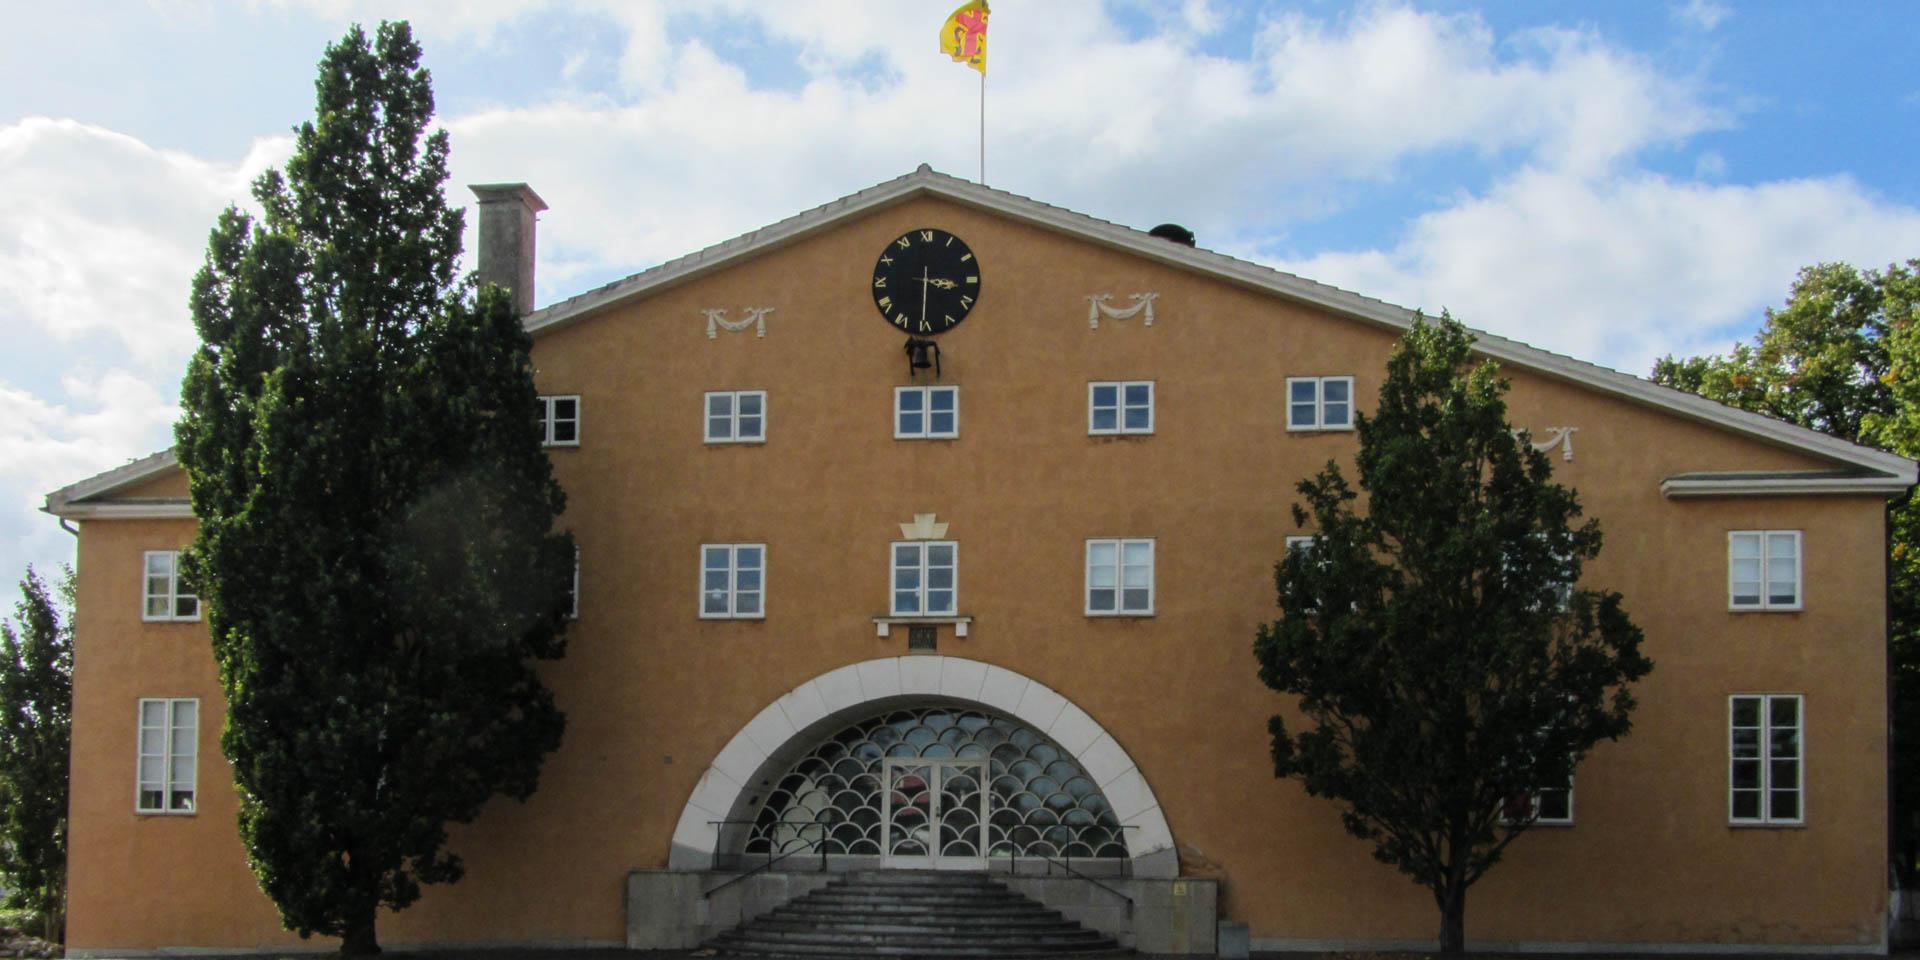 Listers Härads Tingshus 2012